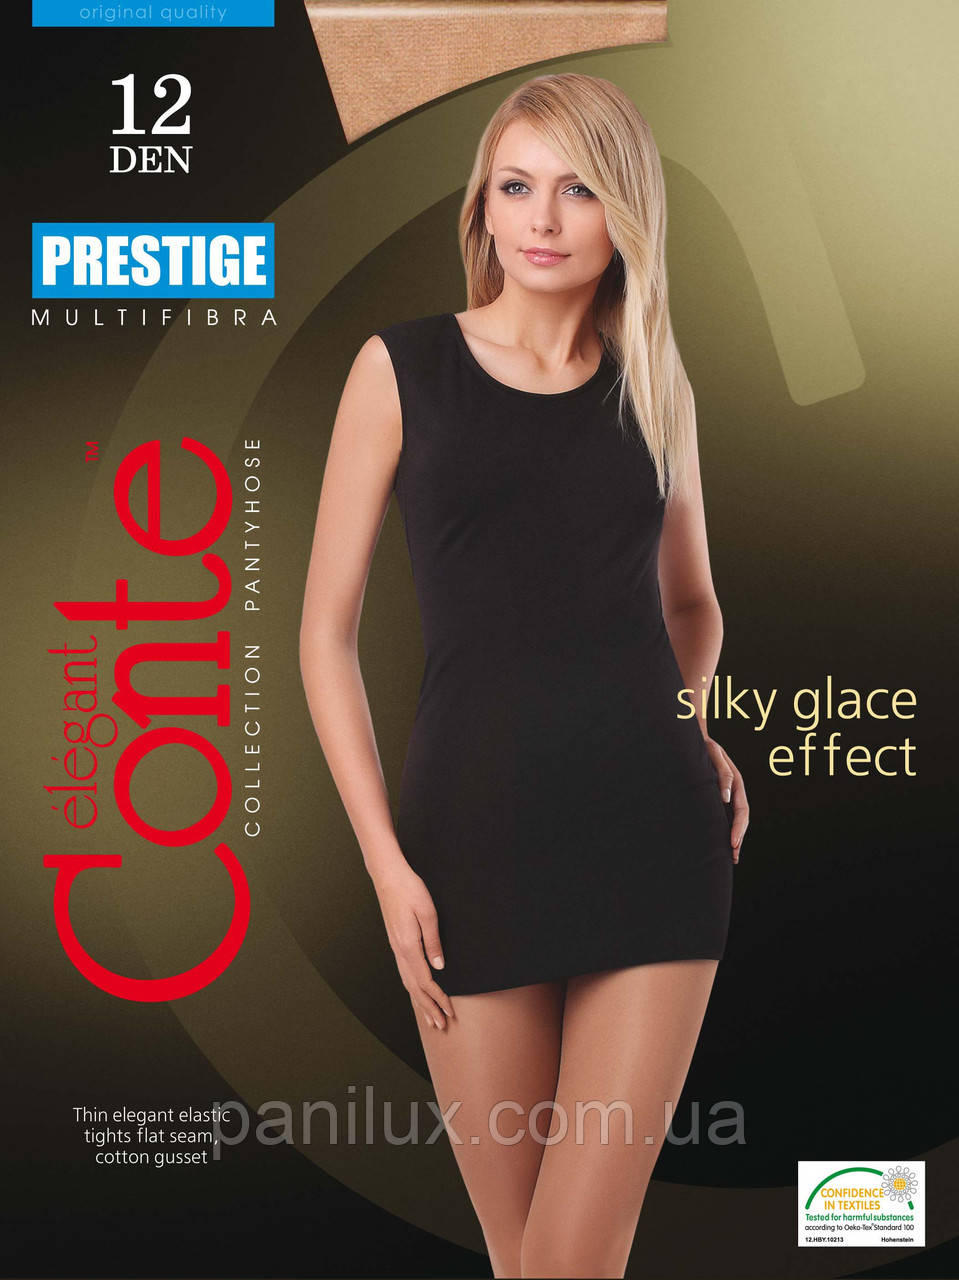 Жіночі колготки Сonte Prestige 12 DEN